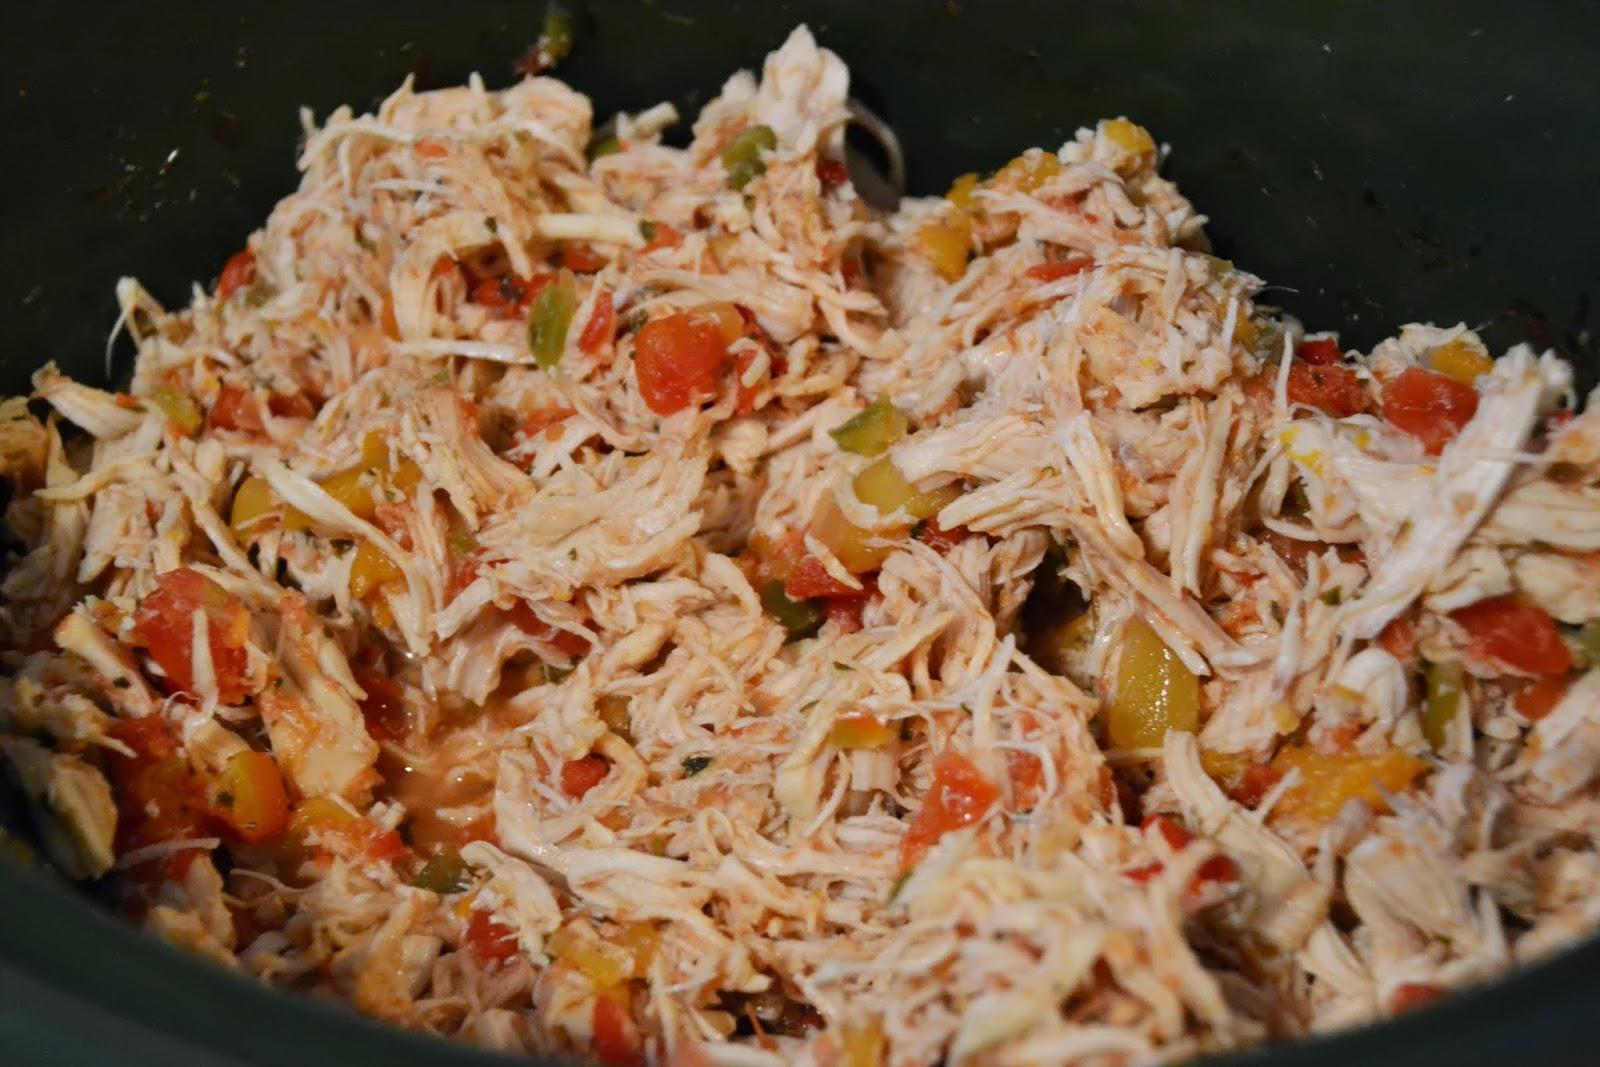 Chicken peach recipe crockpot